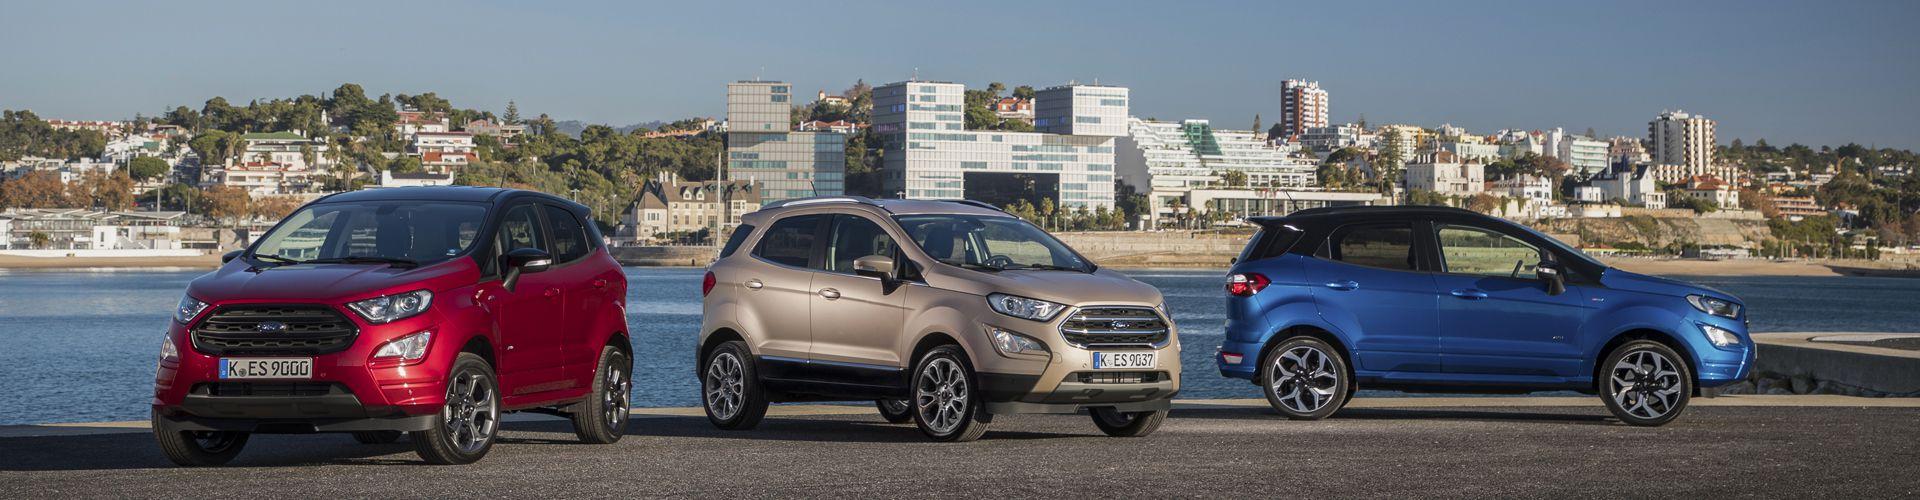 Ford Ecosport - Liapis Cars Bros